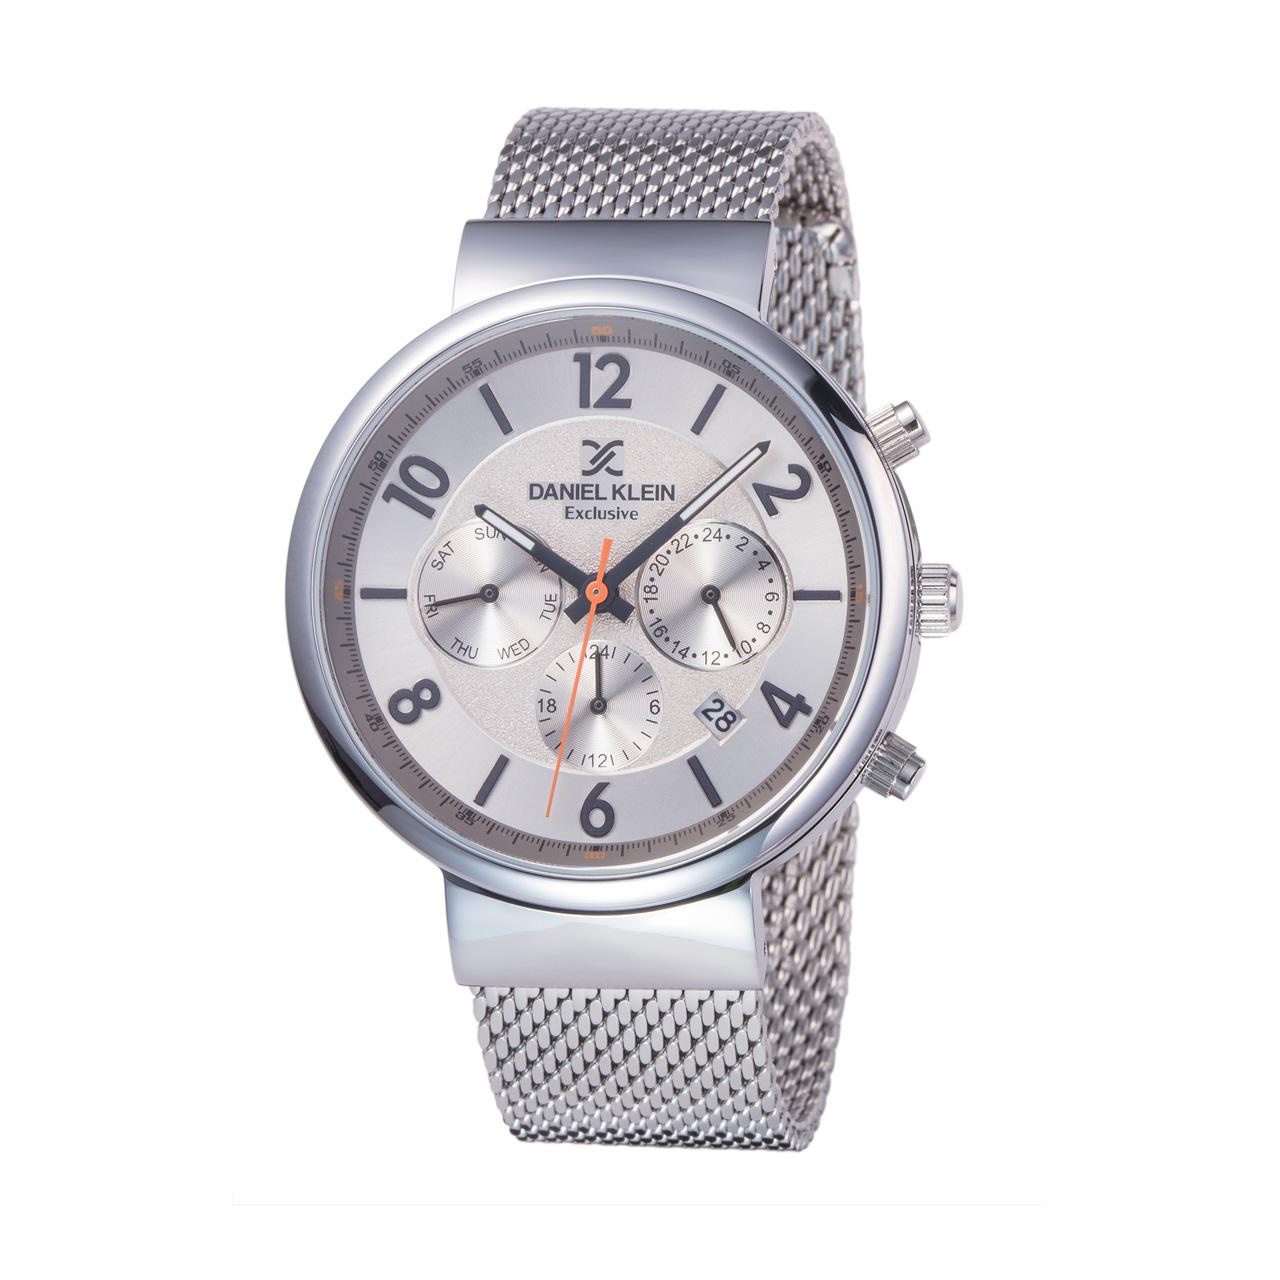 Ceas pentru barbati, Daniel Klein Exclusive, DK11871-4